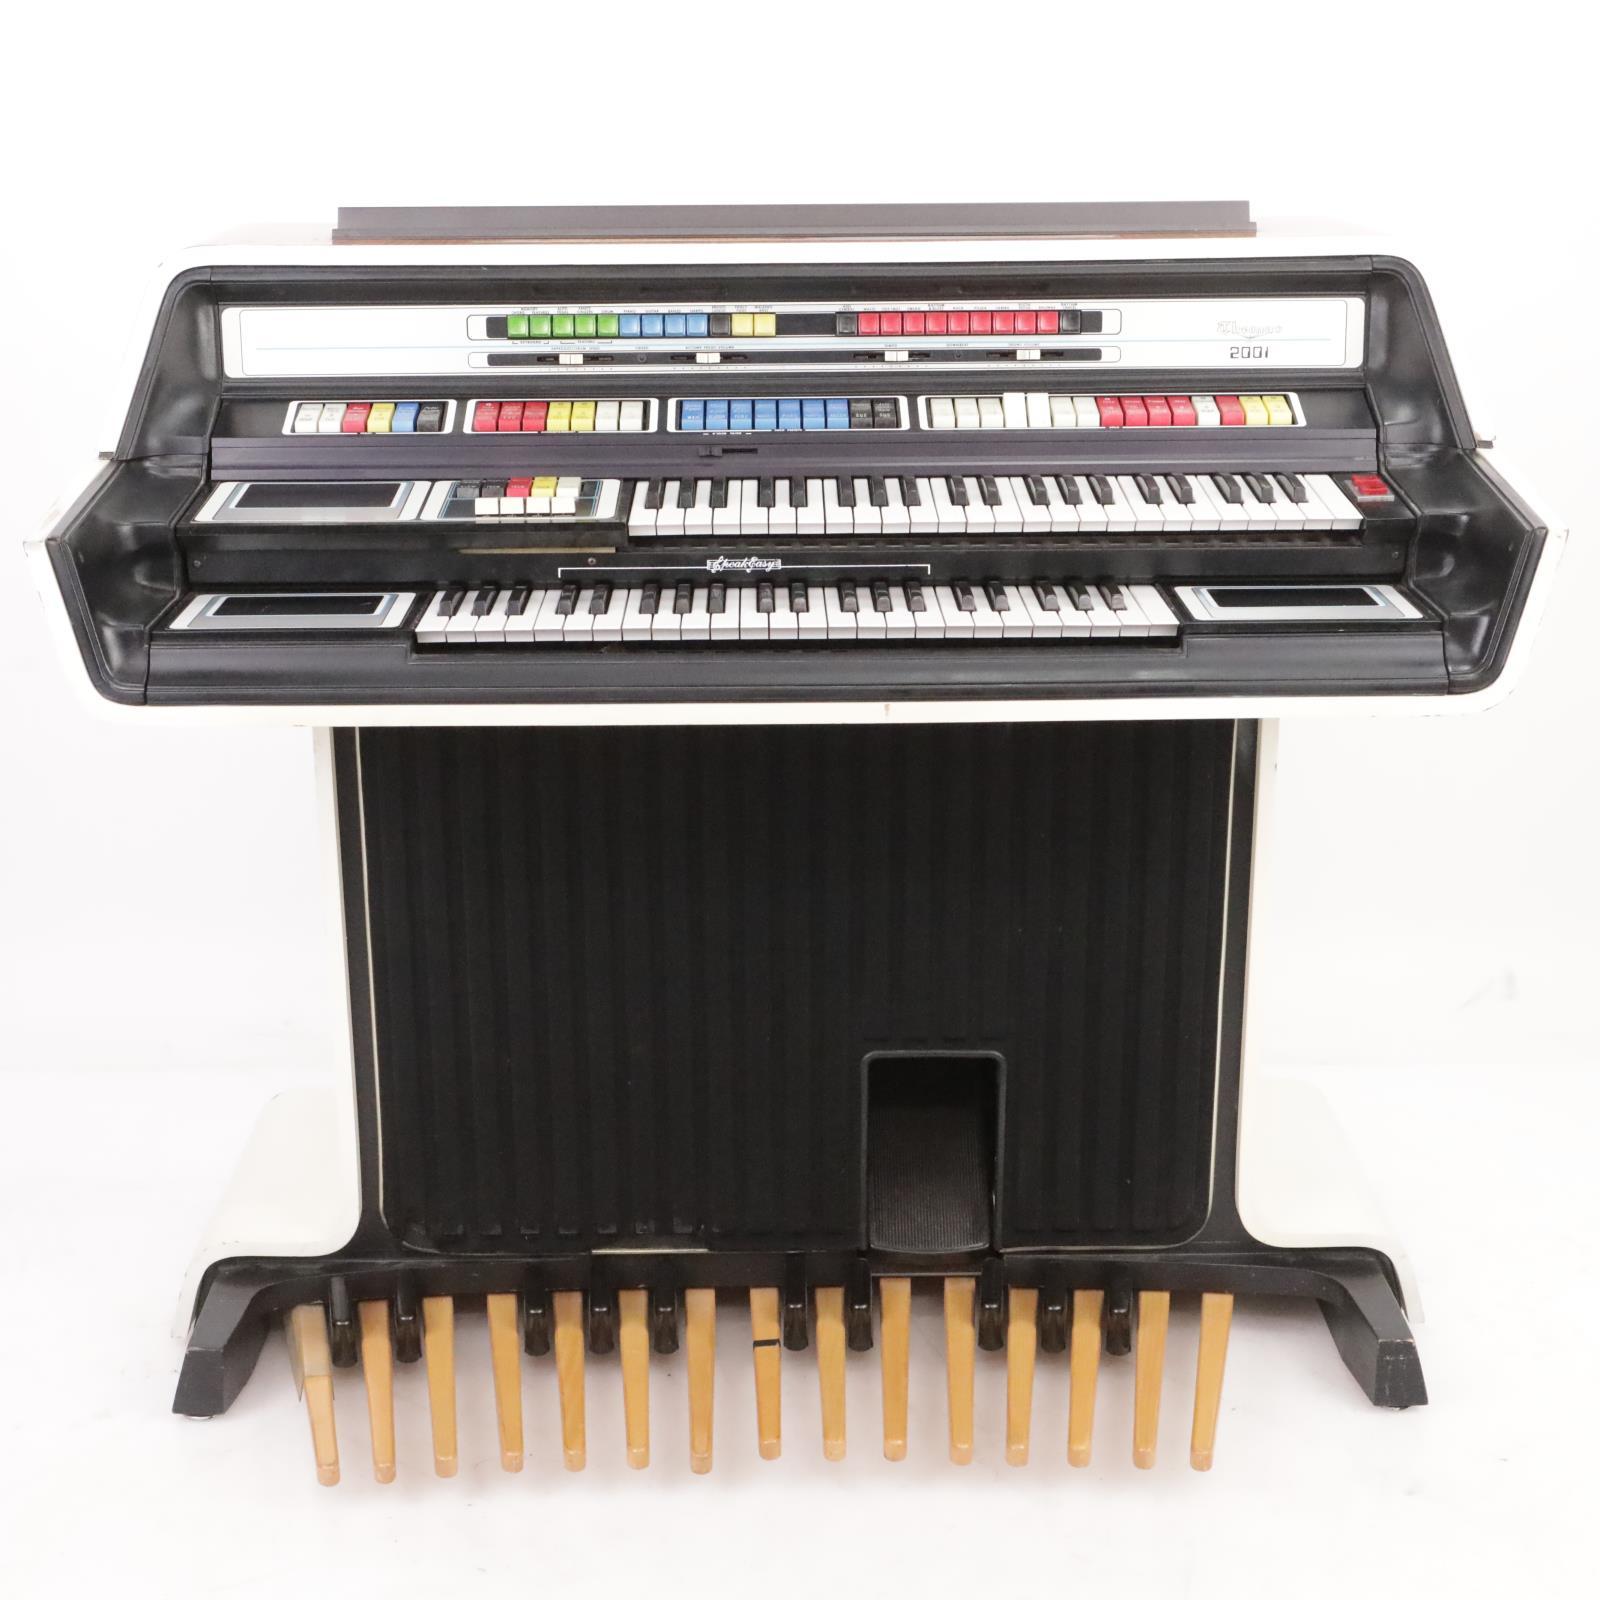 1976 Thomas 2001 2001A5 Organ Keyboard Piano Synthesizer w/ Bench #39390